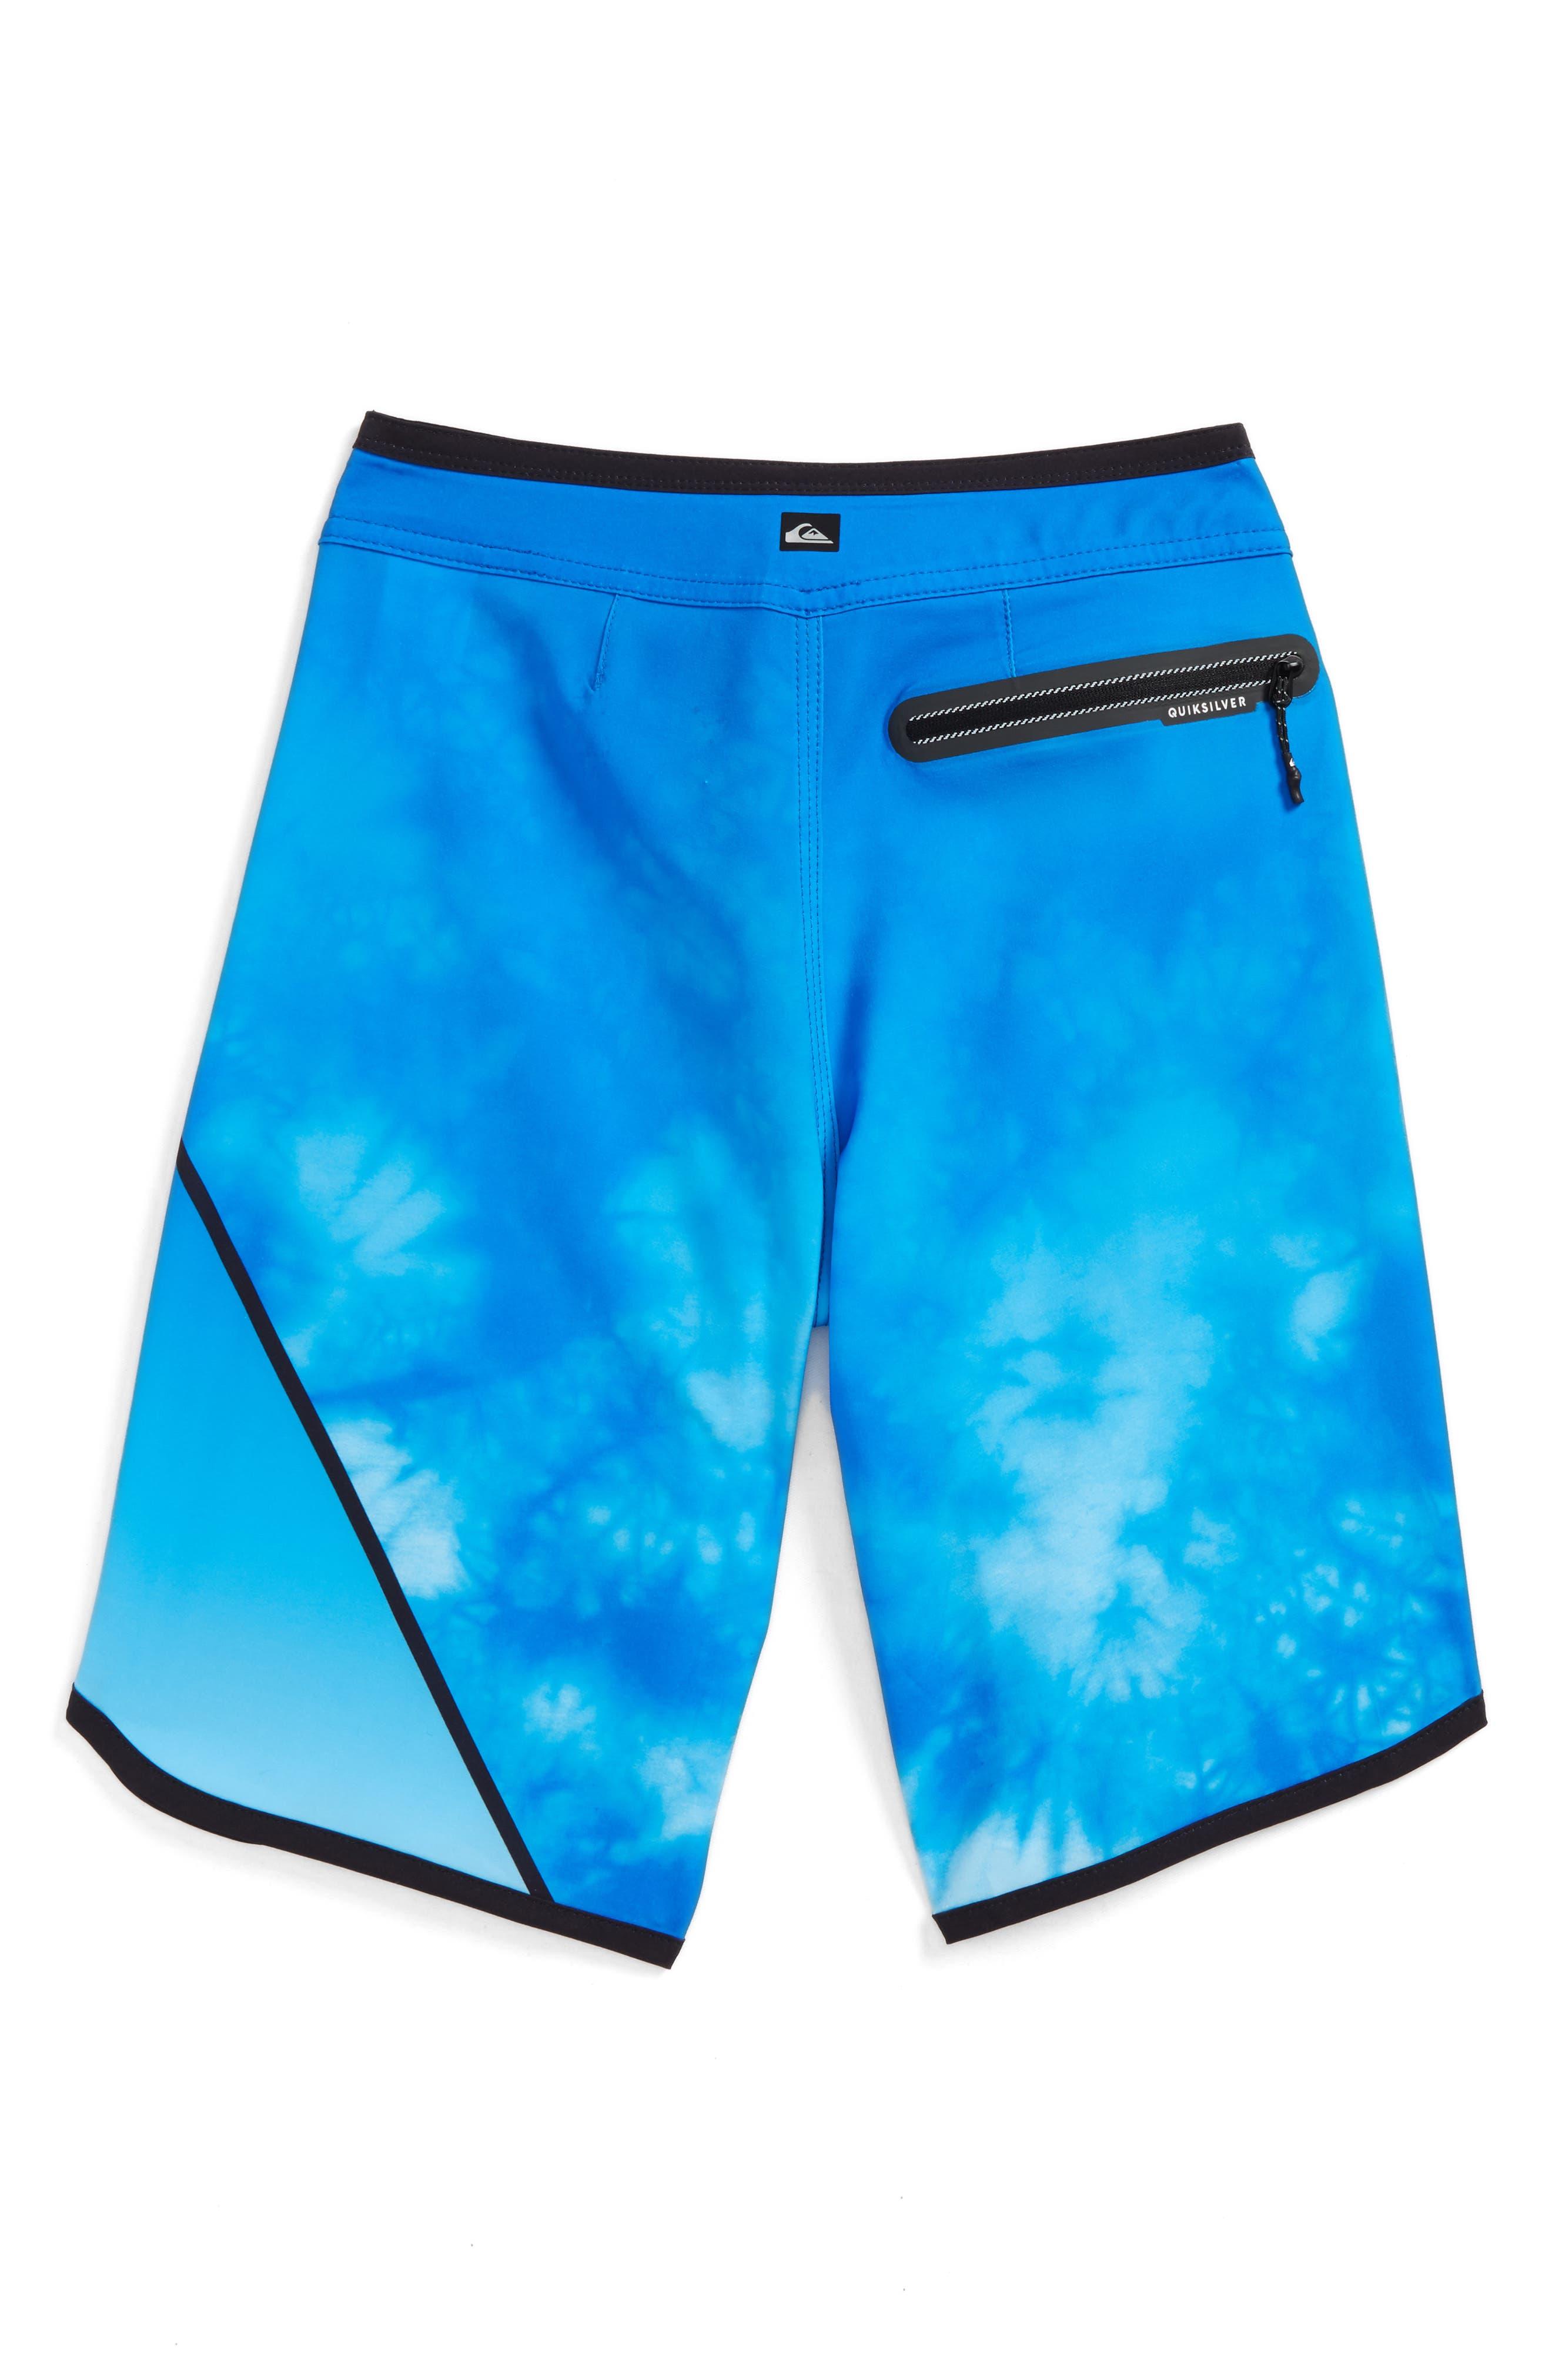 New Wave Board Shorts,                             Alternate thumbnail 2, color,                             421